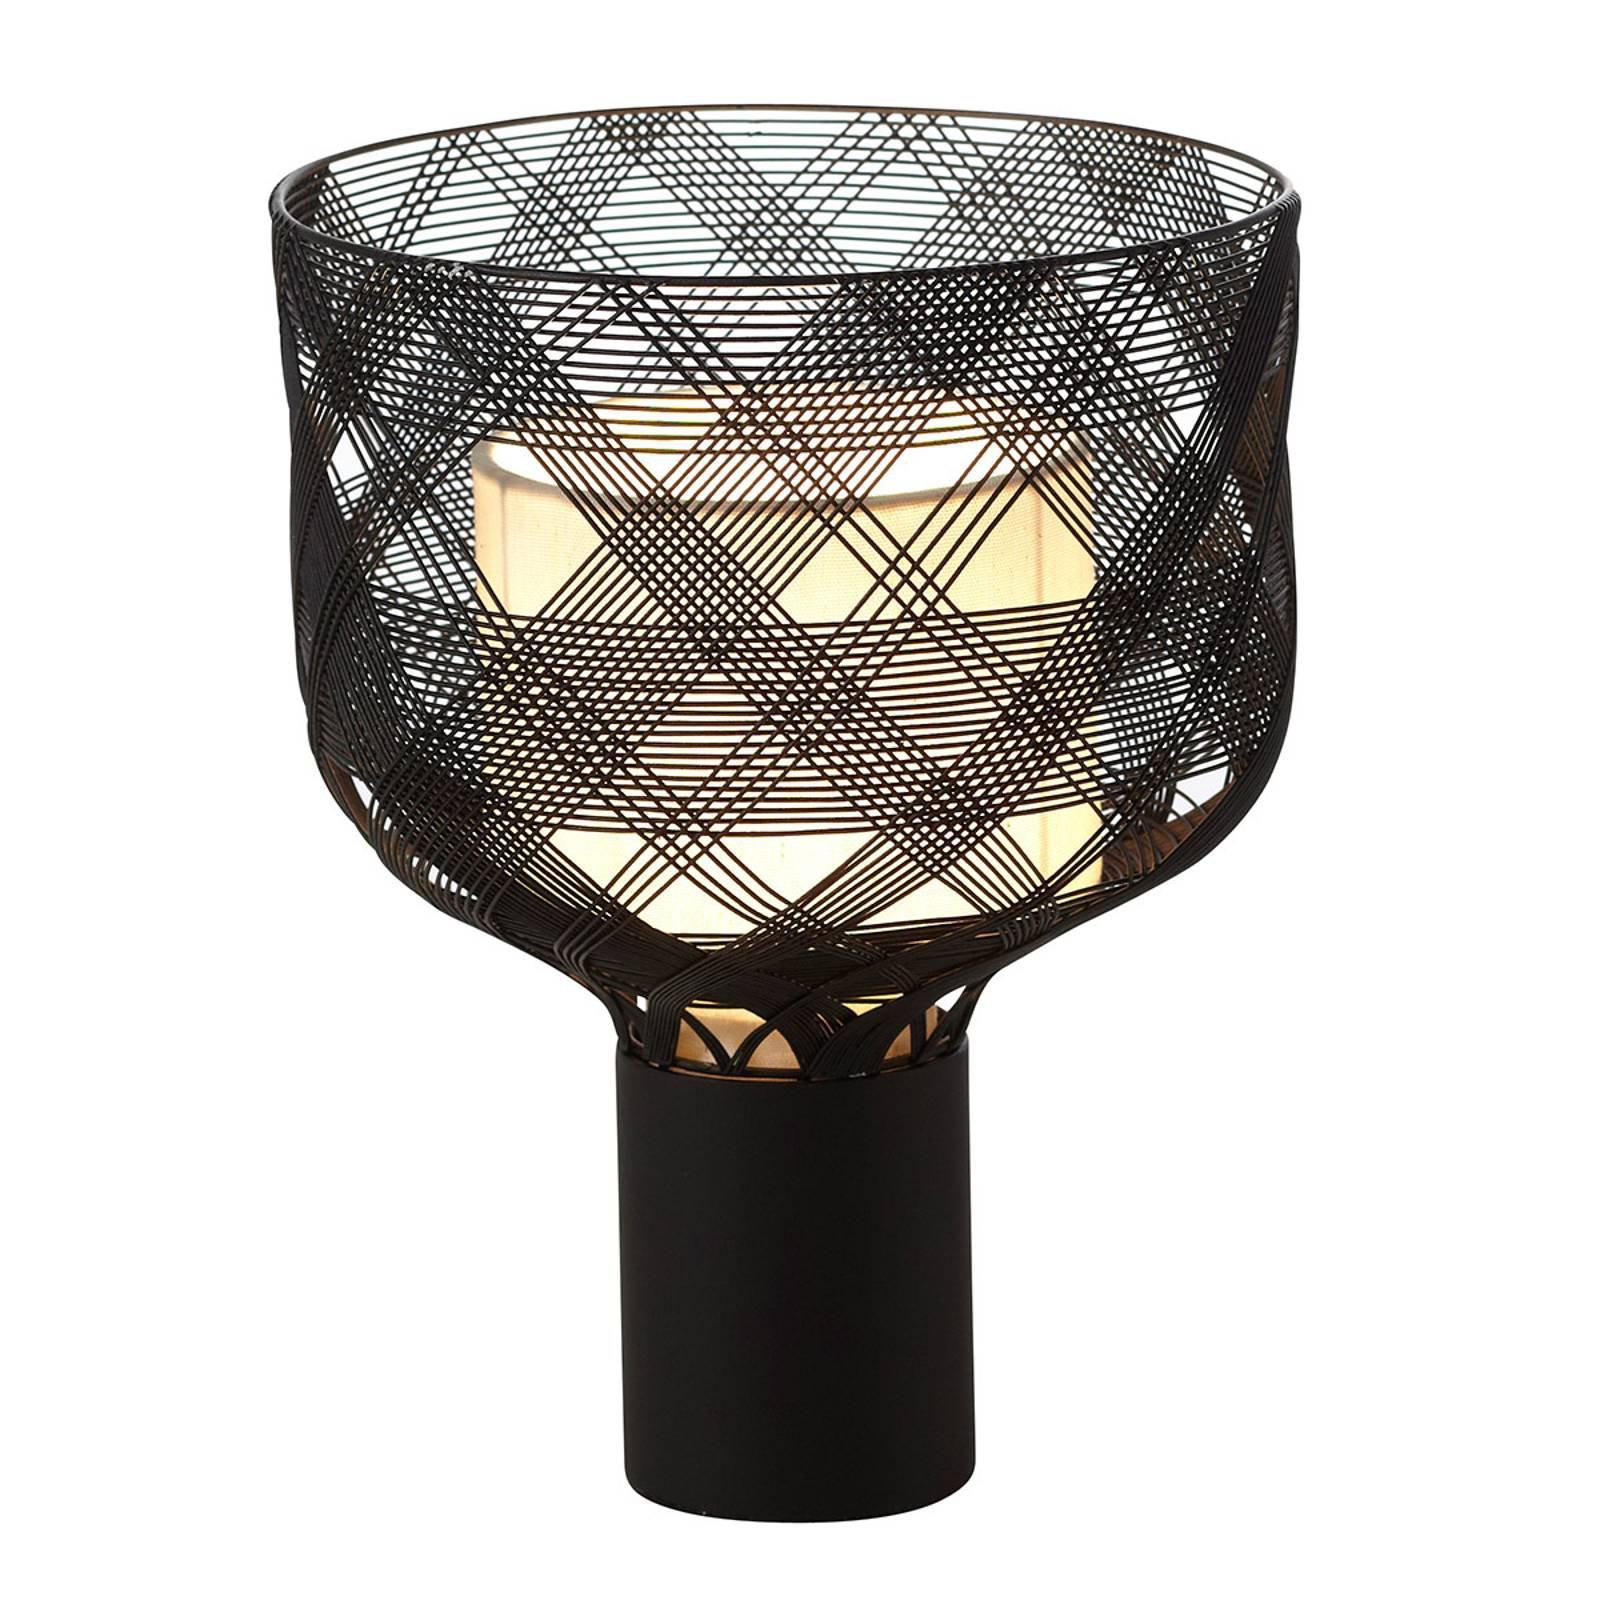 Forestier Antenna S bordlampe, 20 cm, svart